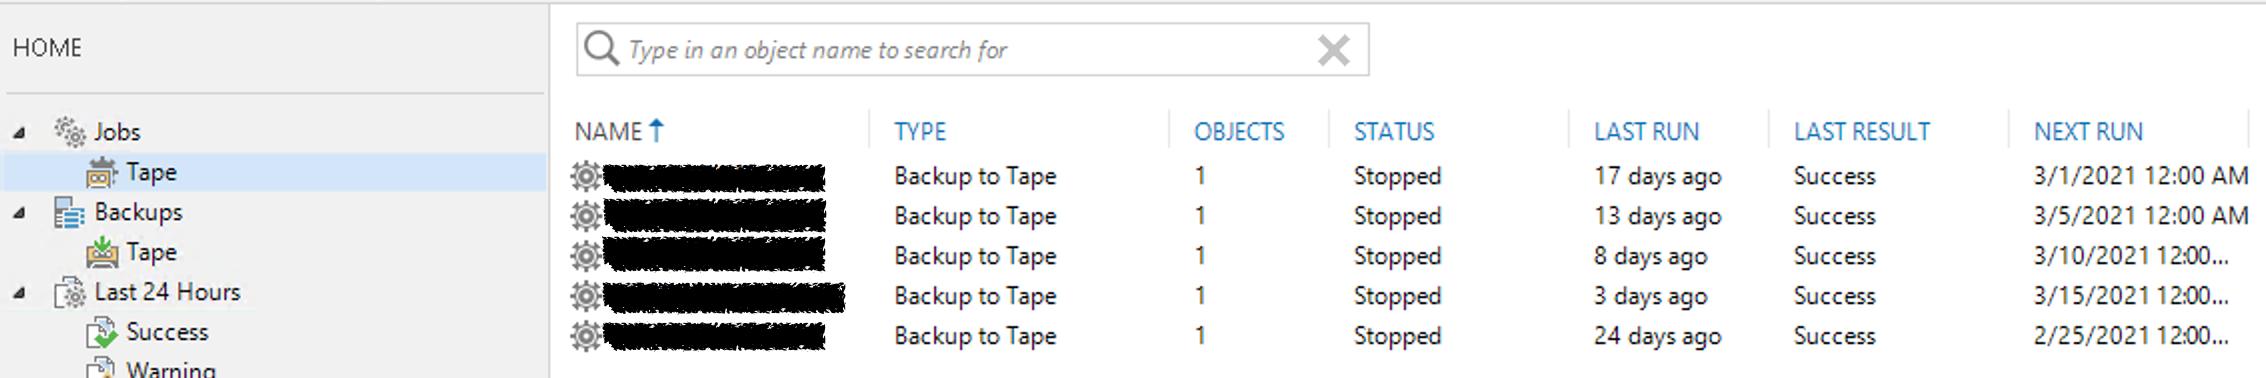 Tenant-to-Tape jobs inside of Veeam targeting AWS.